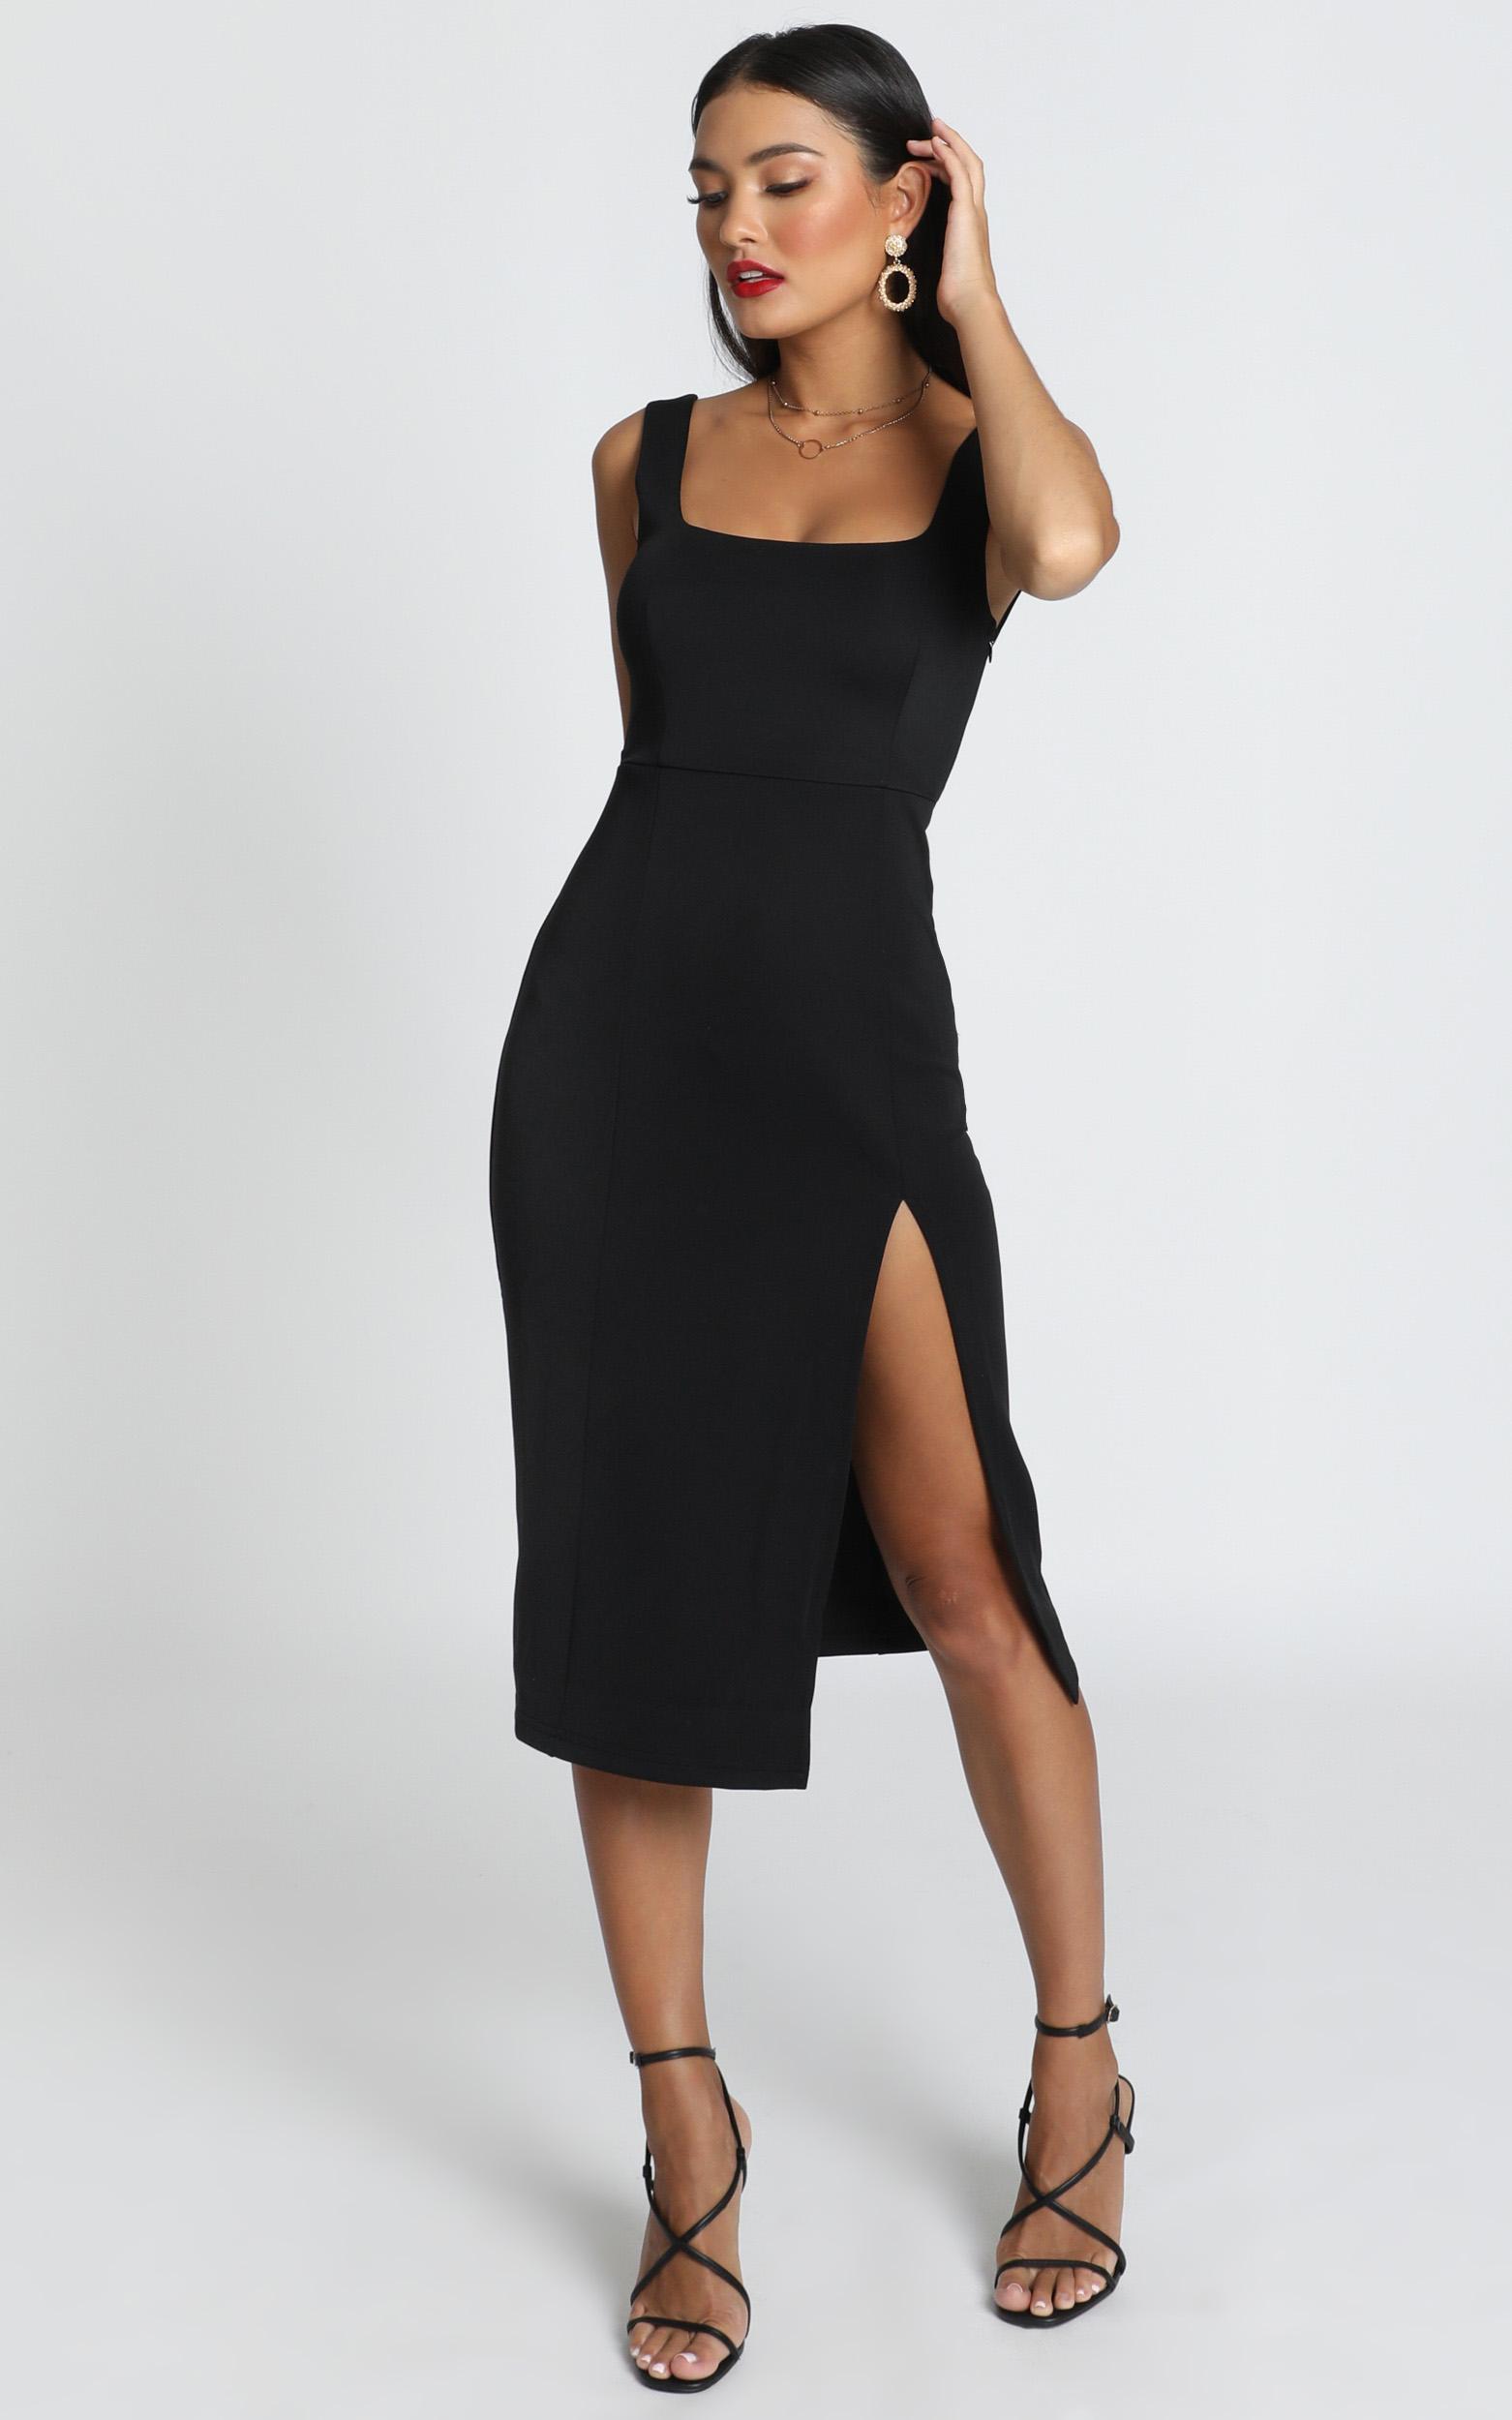 Mini Love Dress in black - 6 (XS), Black, hi-res image number null